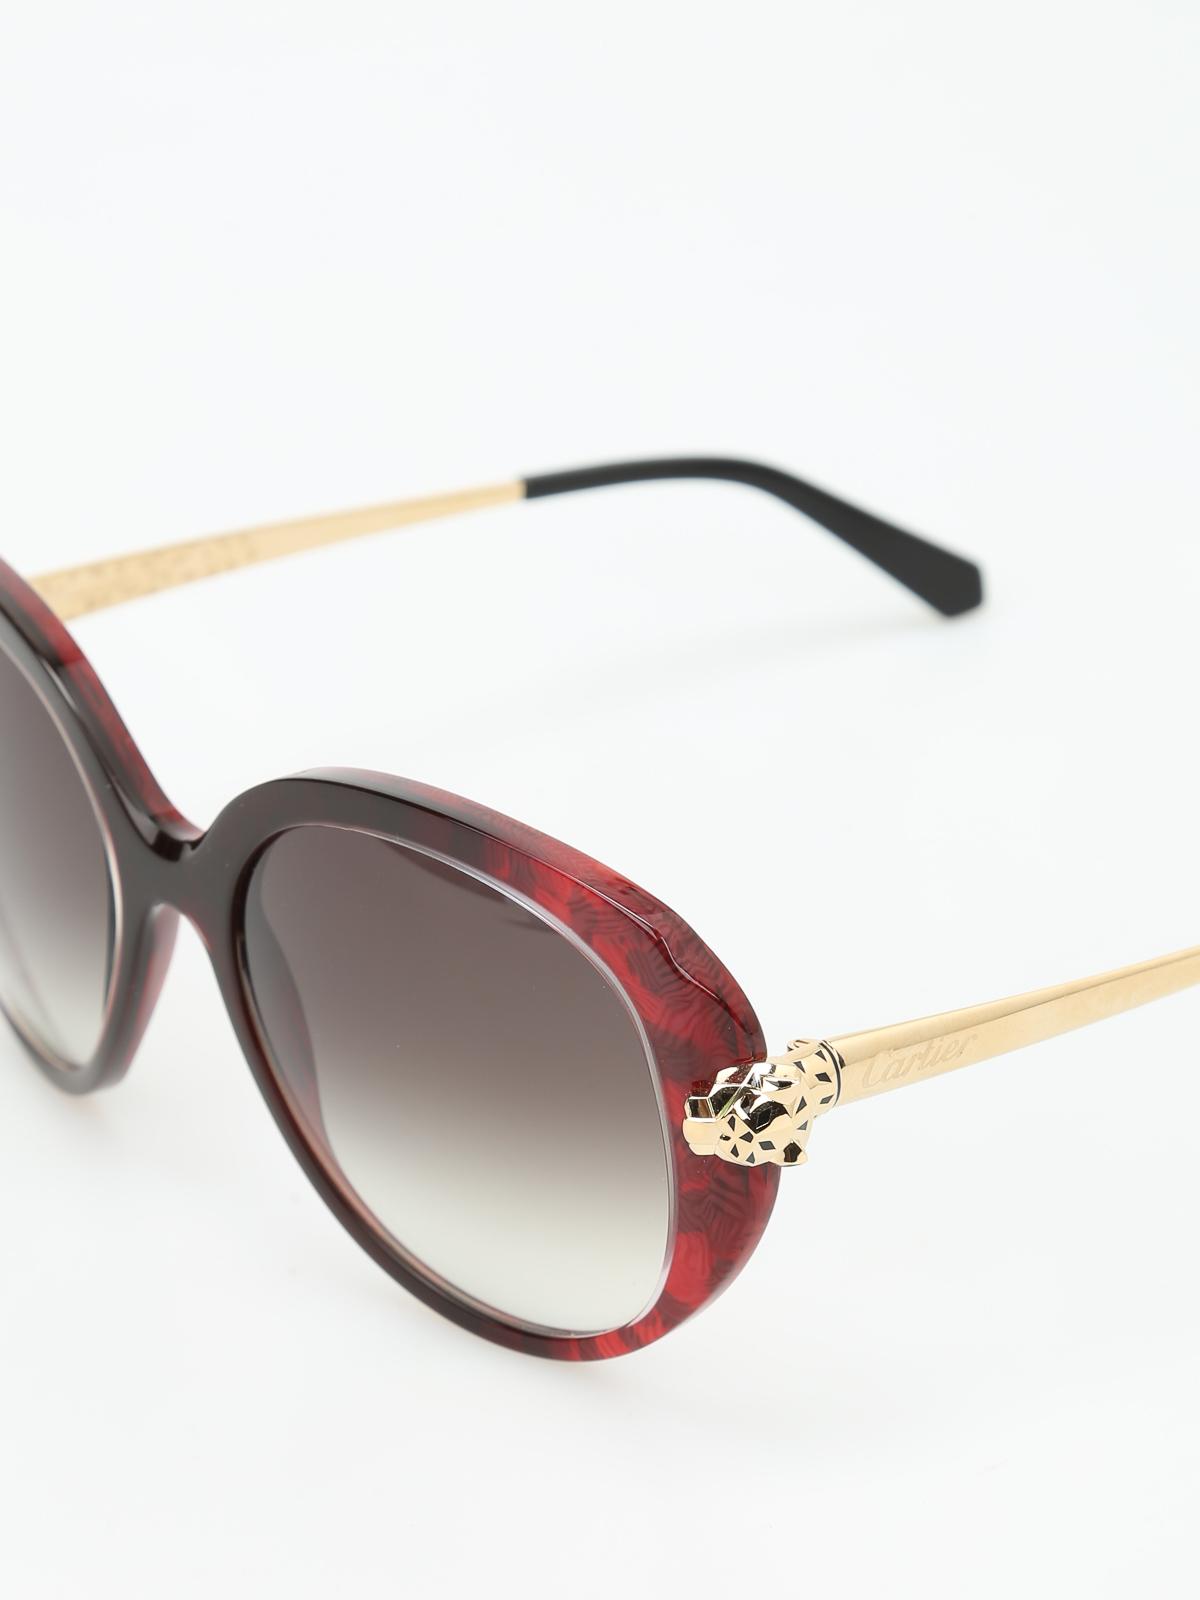 36cdd9c892 iKRIX CARTIER  sunglasses - Panthère Wild de Cartier sunglasses